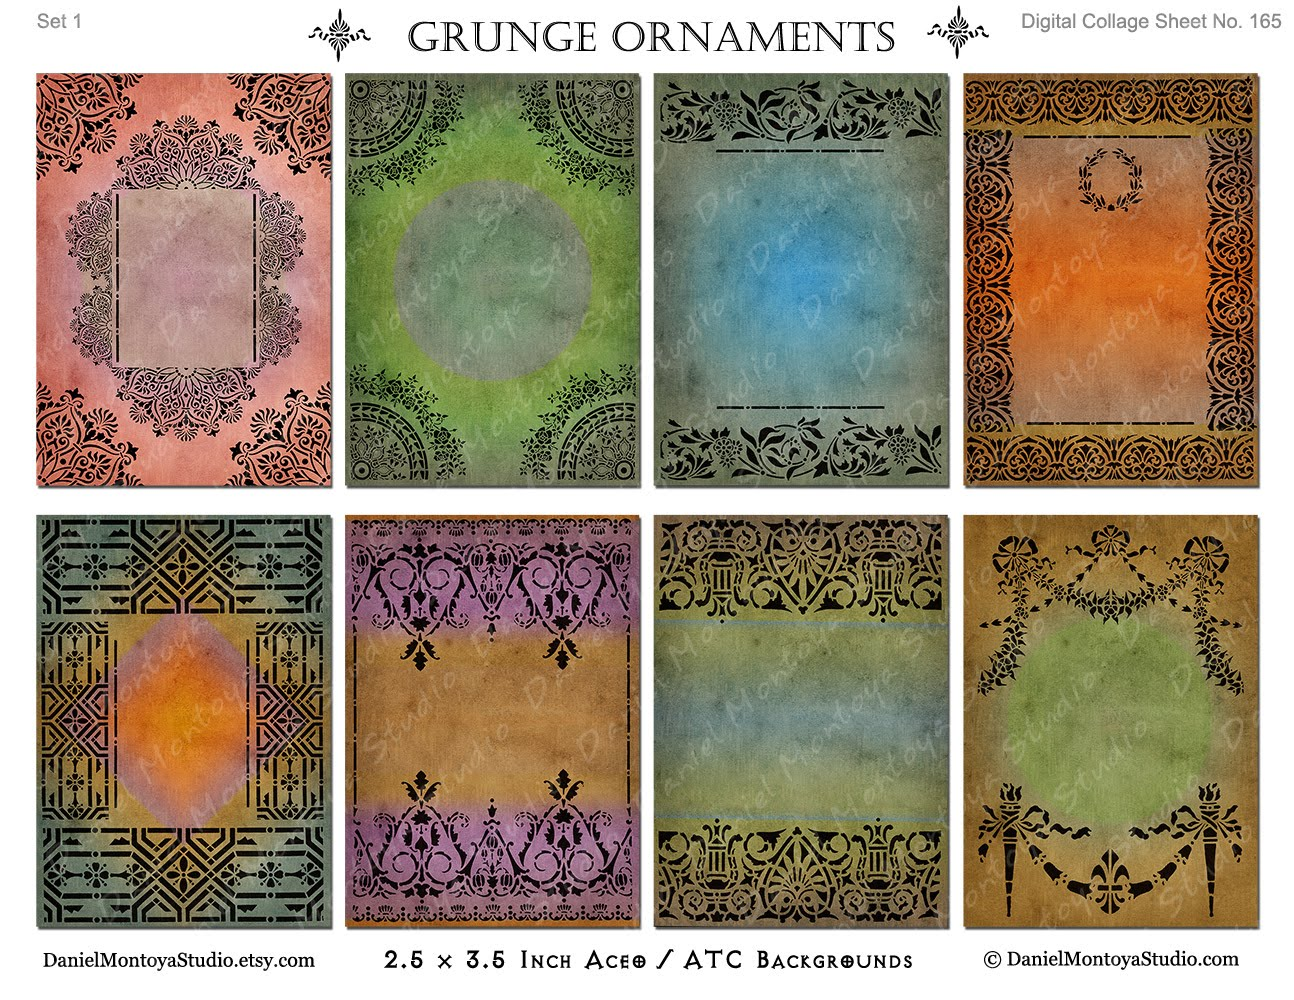 http://1.bp.blogspot.com/_ZmZ2fI1lTlg/S9myB2du6gI/AAAAAAAAAQM/RfxCnzbNe7I/s1600/Grunge_Ornaments_01_Web.jpg